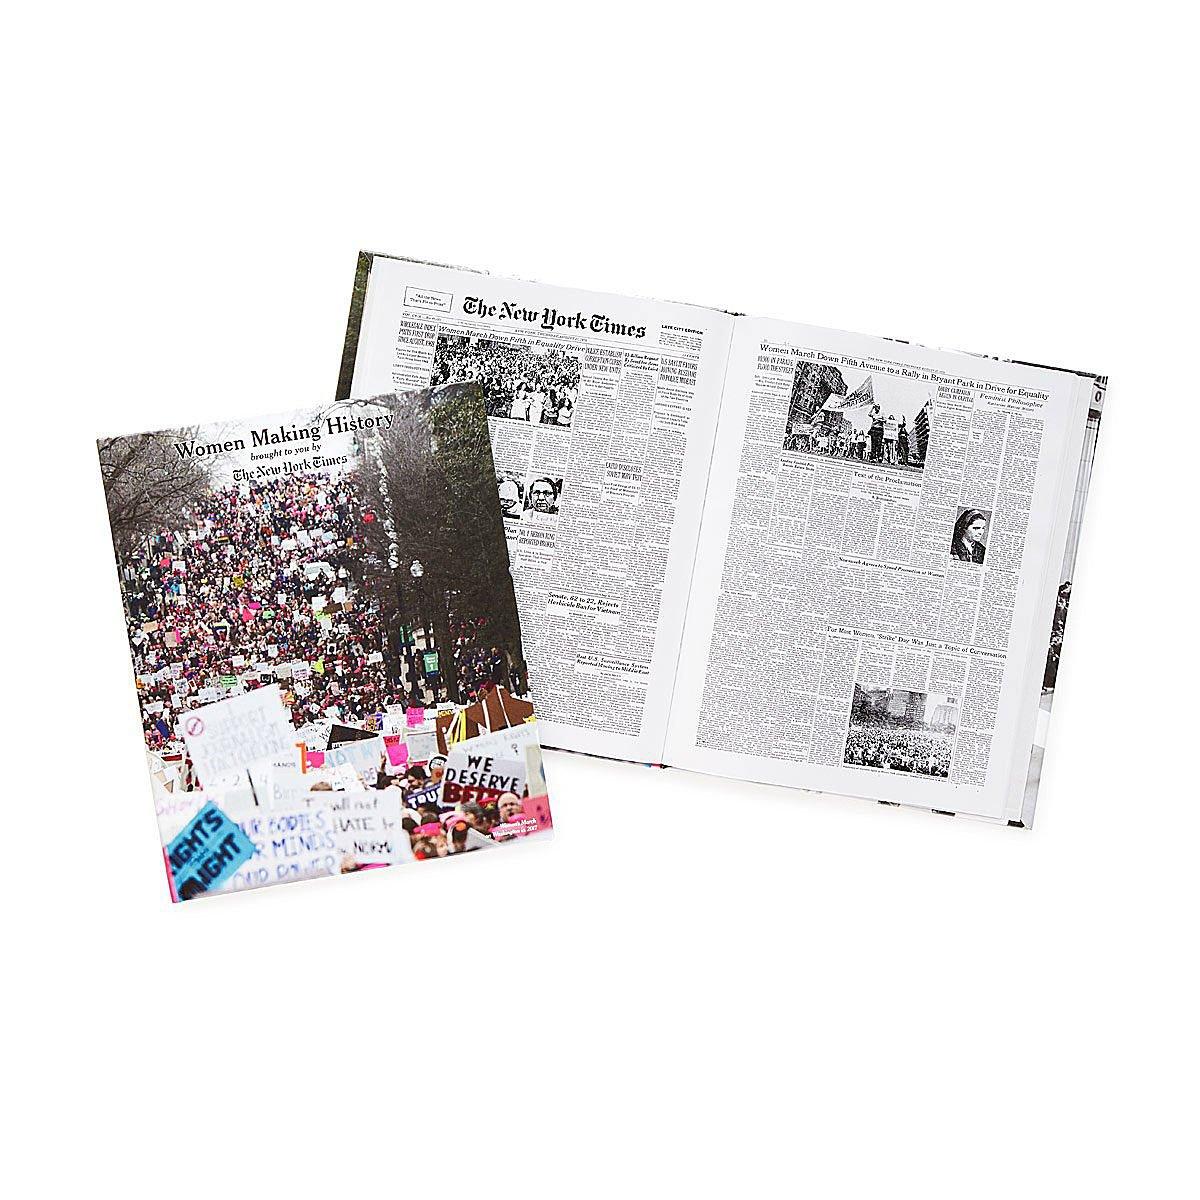 New York Times Women Making History Female Empowerment